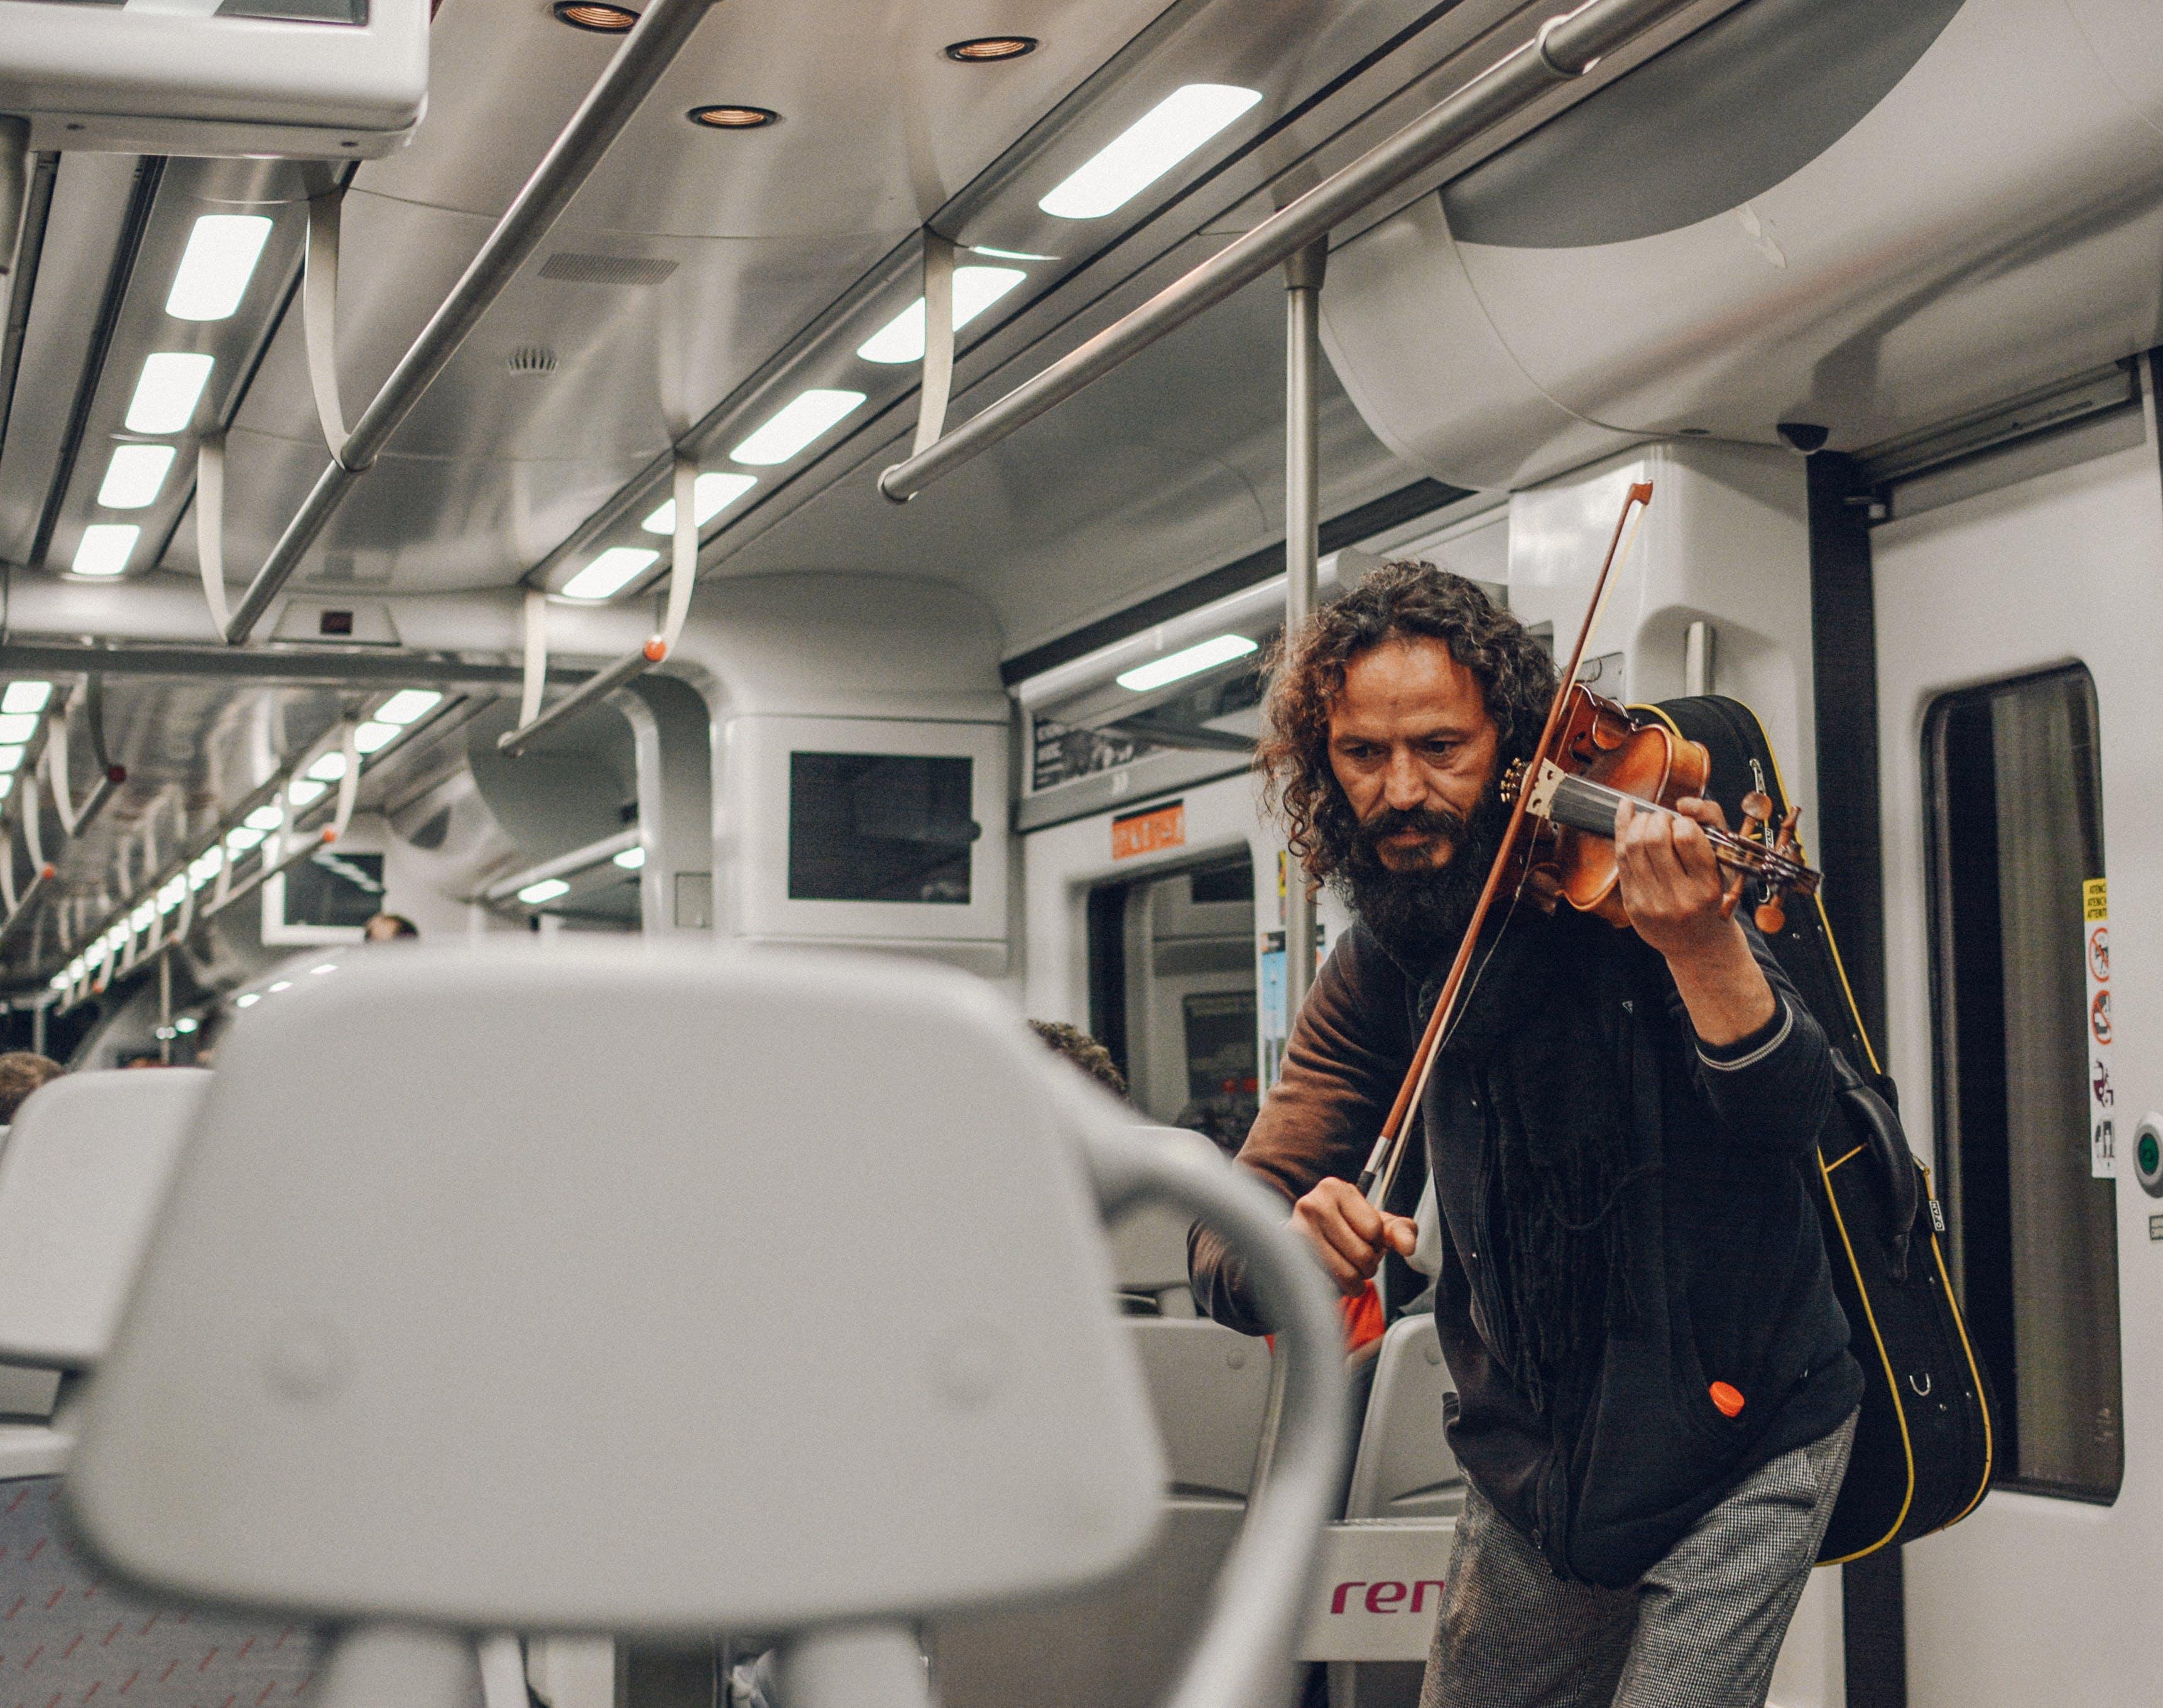 Man Playing Violin Inside Train